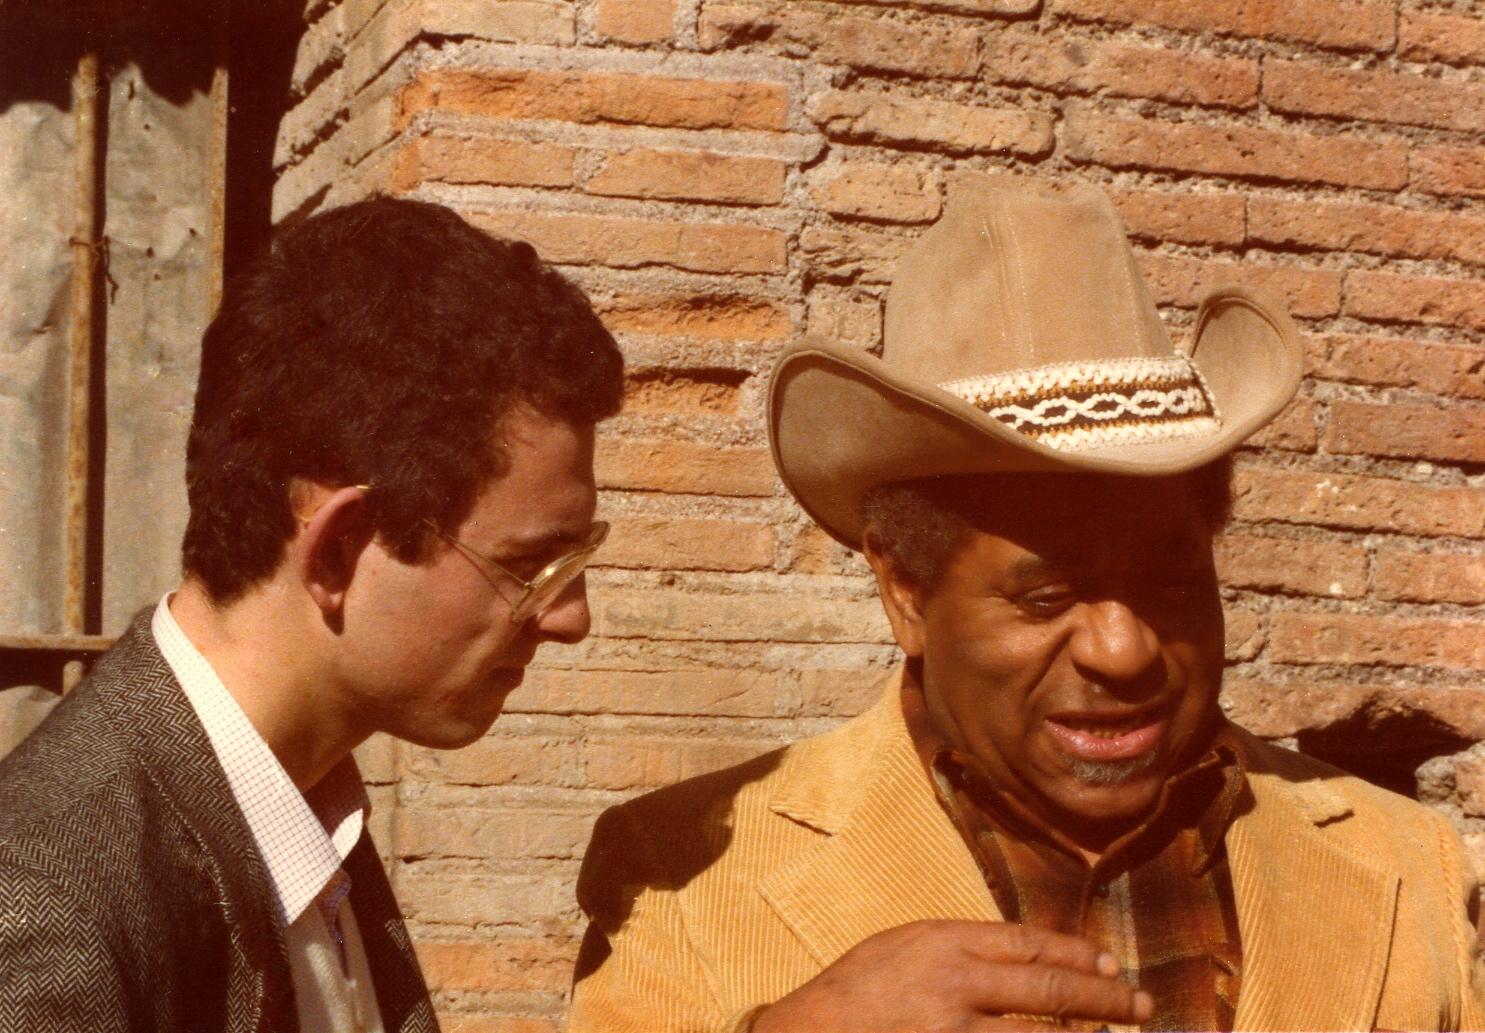 Francesco Crosara with Dizzy Gillespie, Rome Coliseum 1980